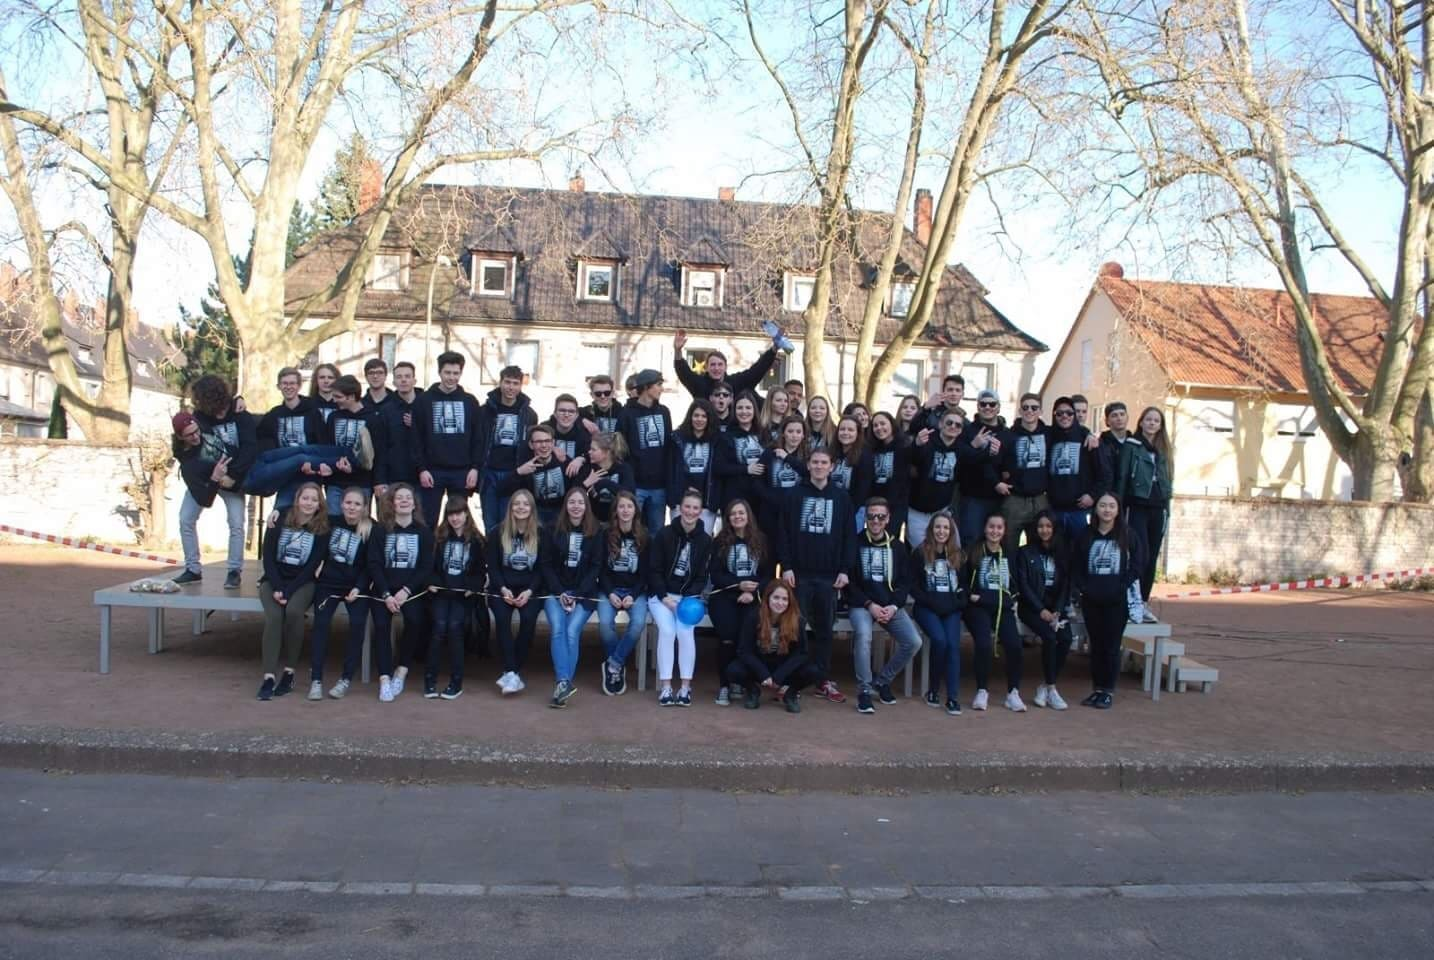 Max Planck Gymnasium Ludwigshafen